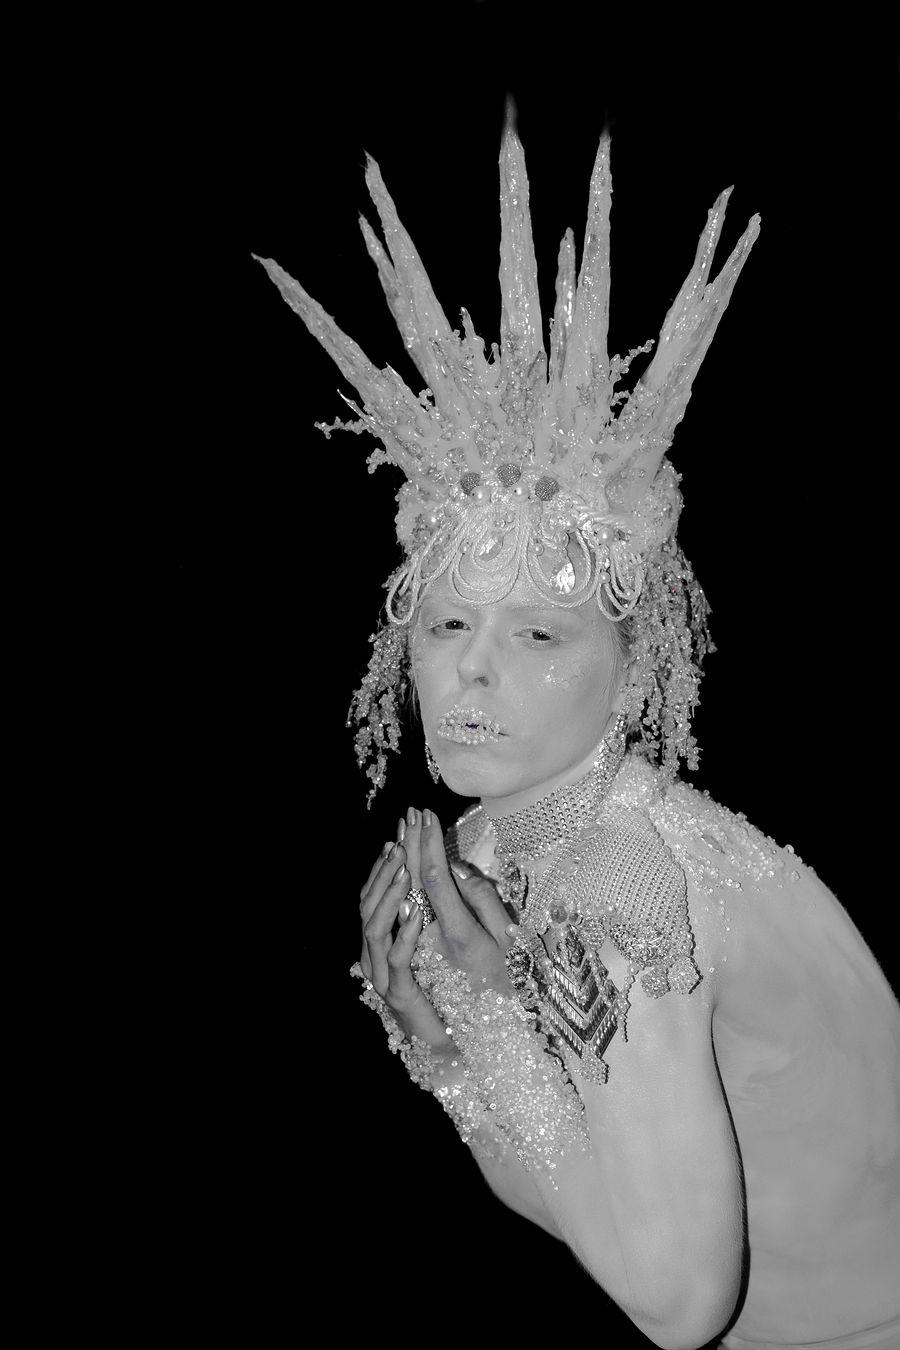 Couture Ice Queen Bodypaint / Model Nix Brown, Makeup by pierangela manzetti, Stylist pierangela manzetti, Artwork by pierangela manzetti, Designer pierangela manzetti / Uploaded 24th October 2016 @ 04:55 PM